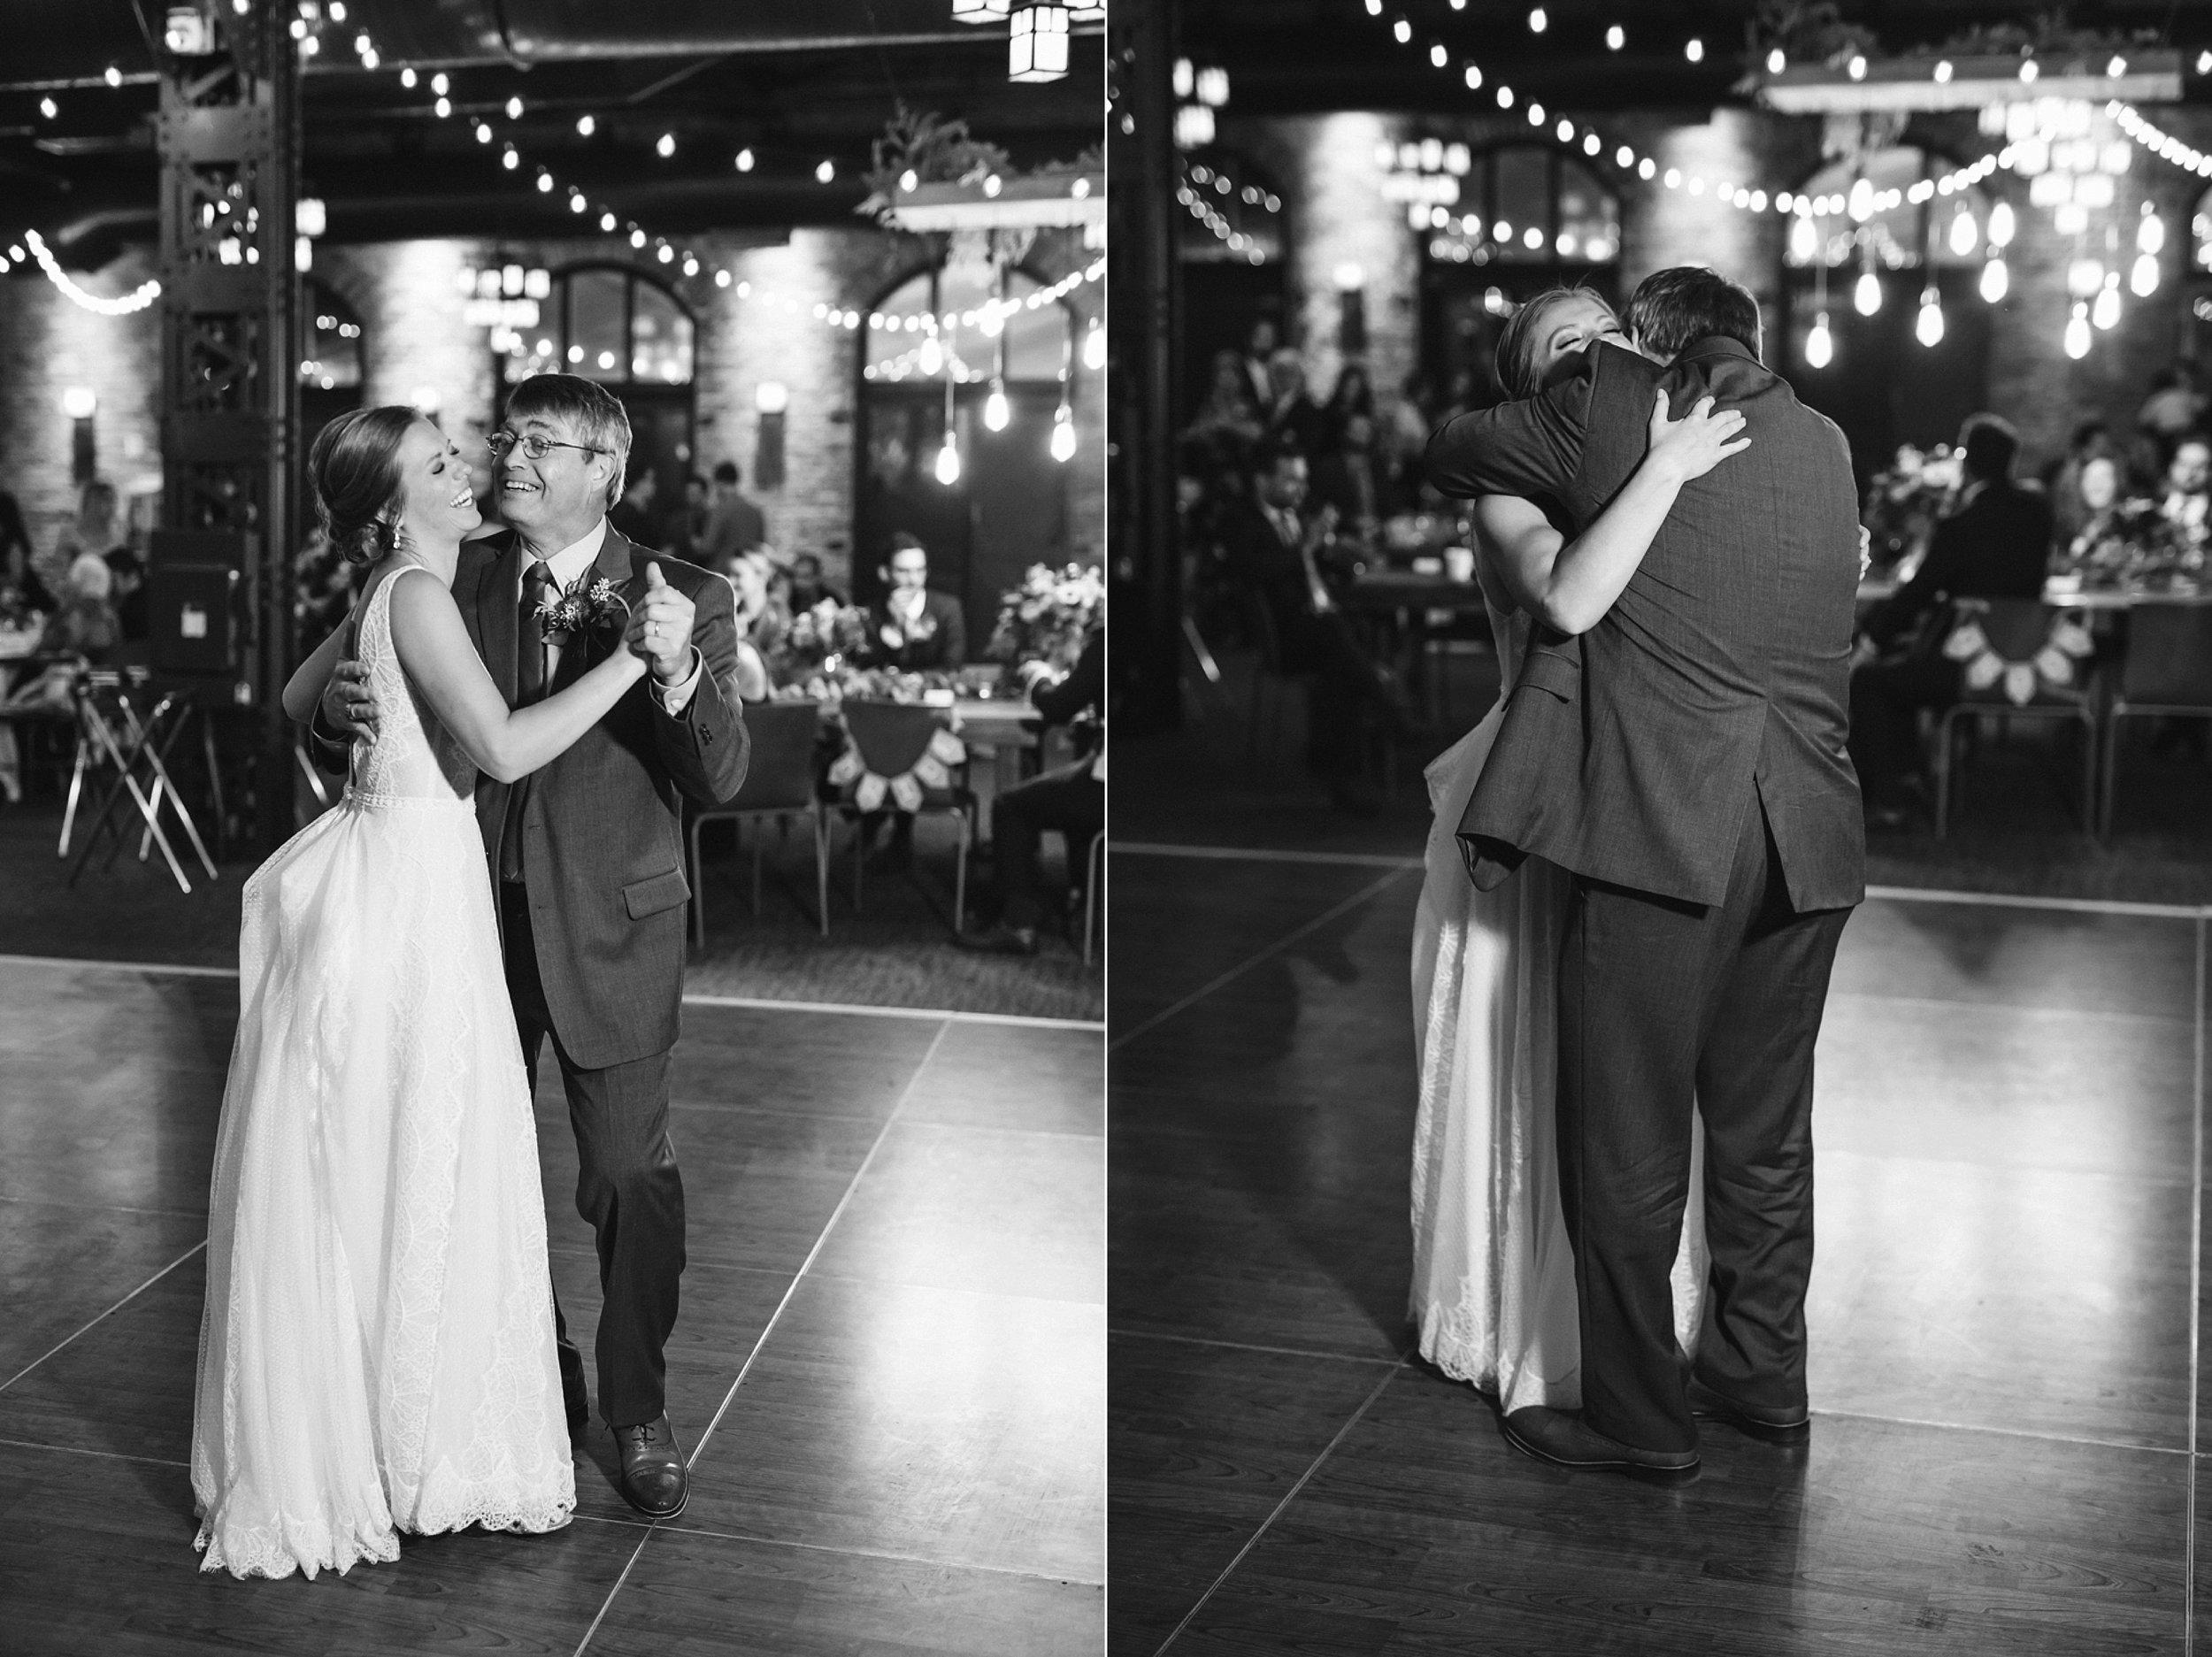 Nicollet-Island-Pavilion-Minneapolis-September-Coral-Navy-Wedding-173.jpg